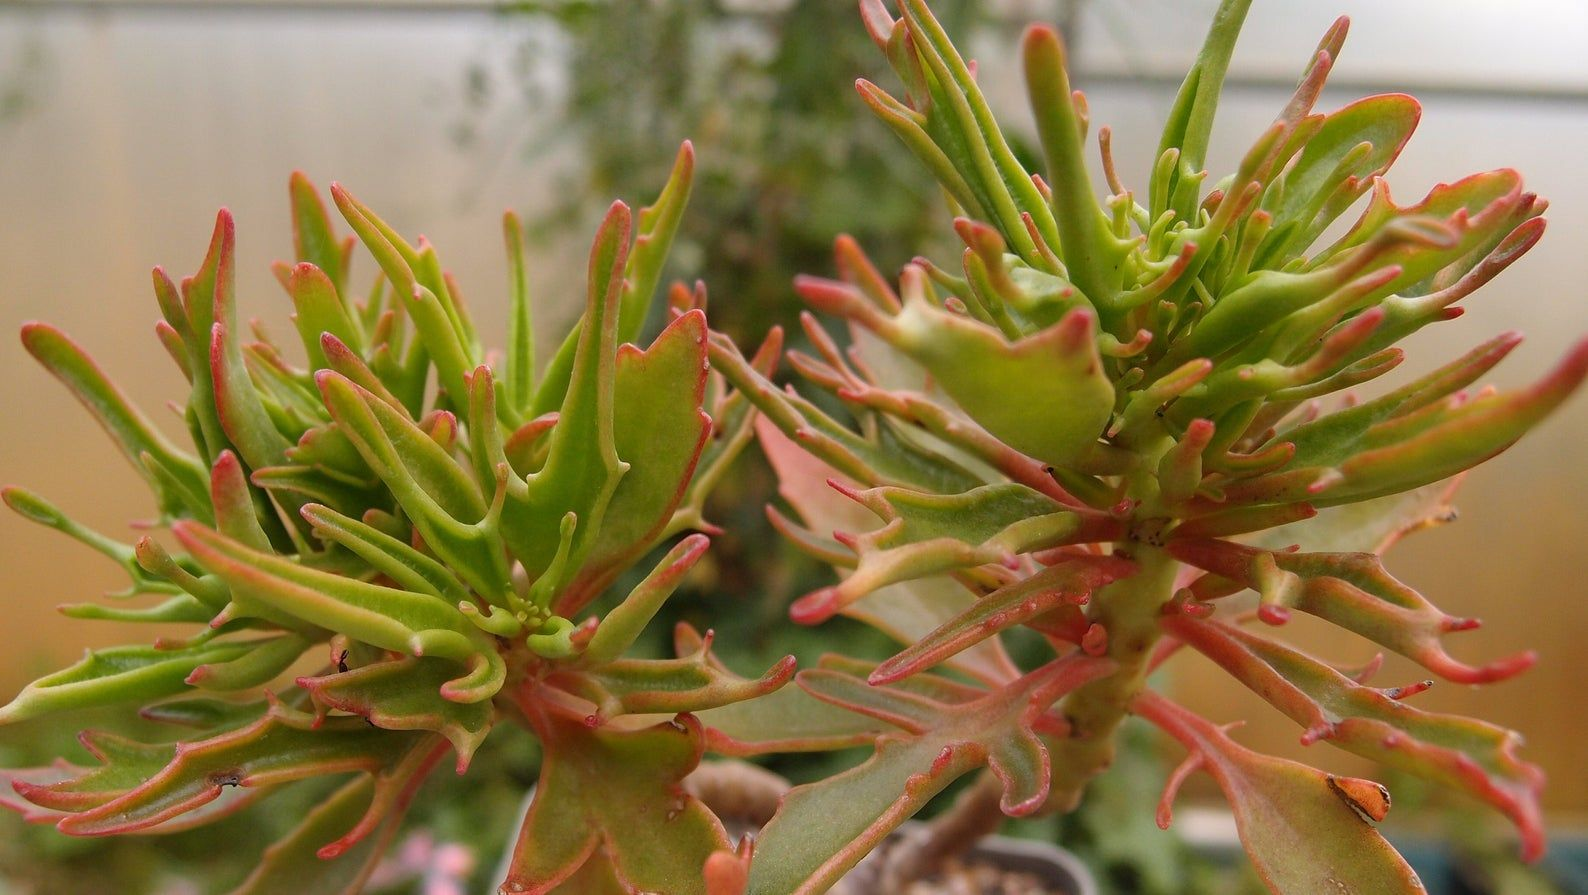 Kalanchoe 'Green Spider' live succulent plant | Planting ...